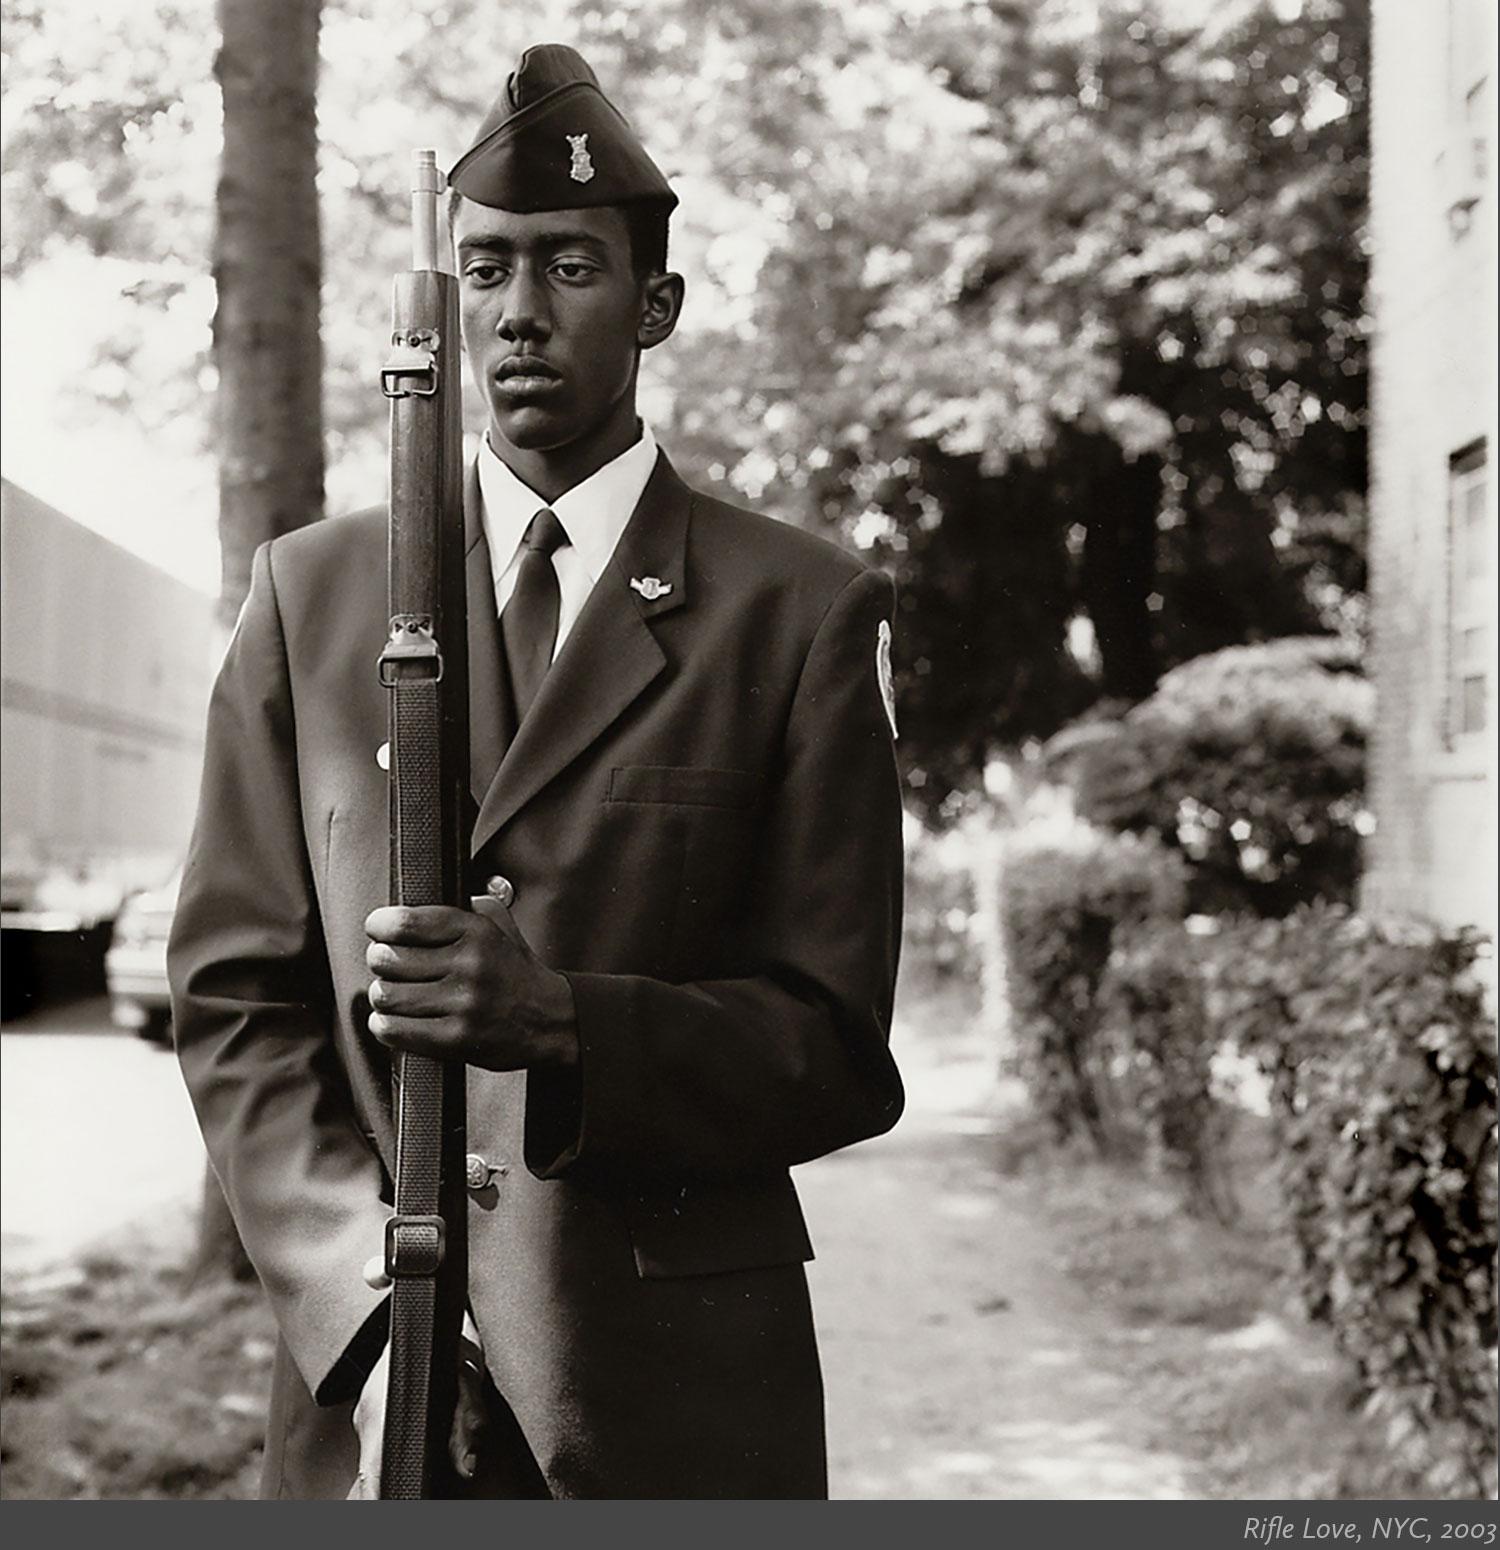 11-Rifle-Love-NYC-2003-EDGES.jpg